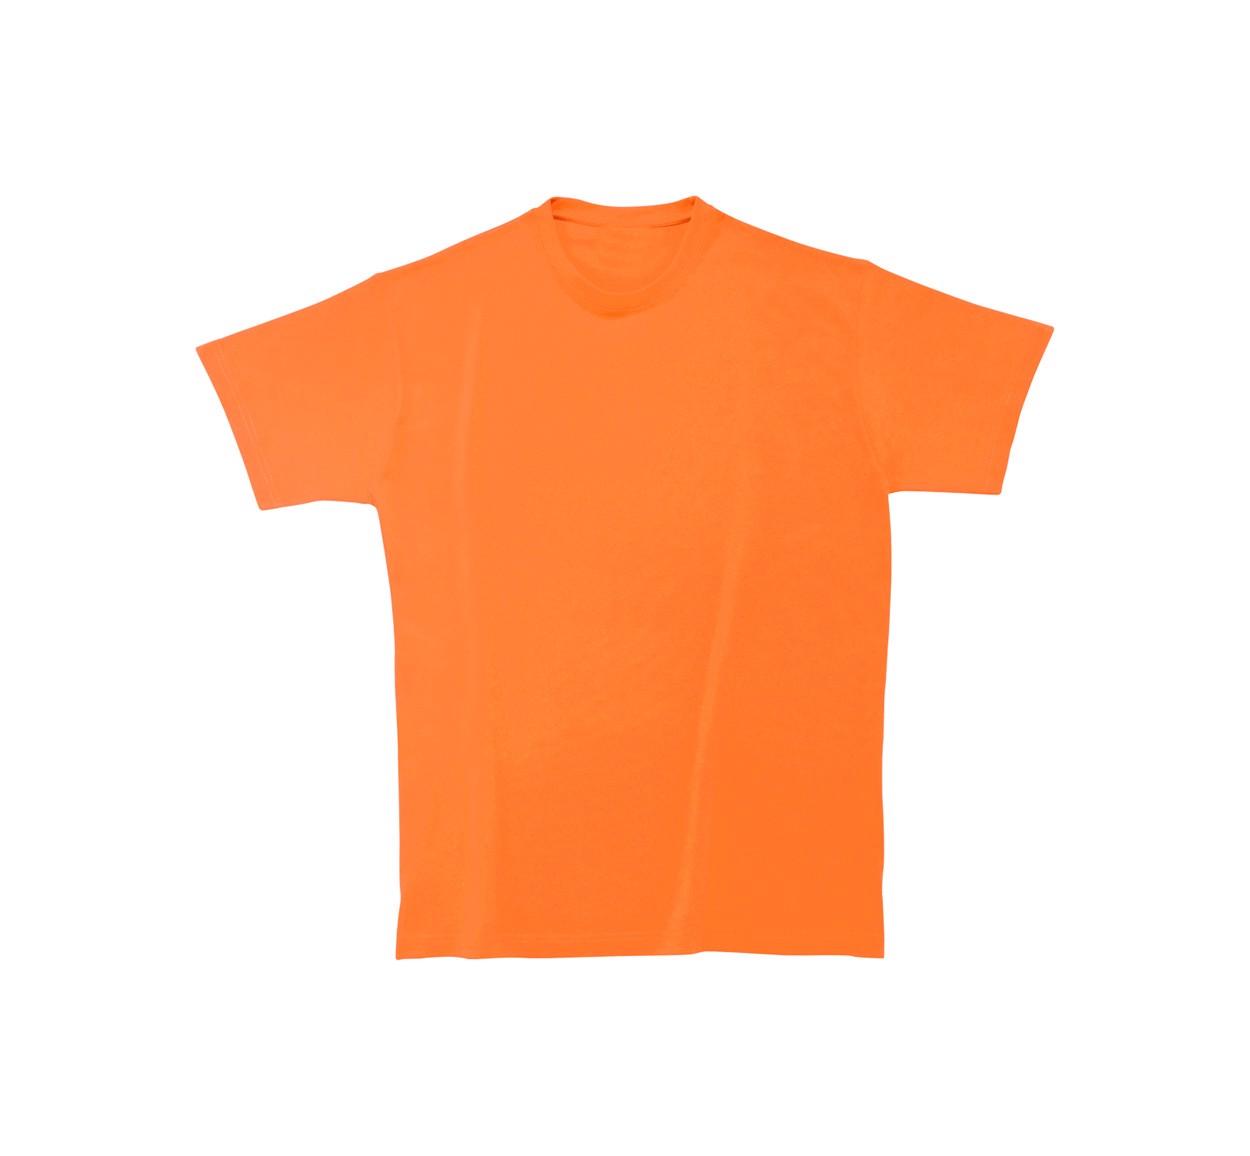 Tričko Softstyle Man - Oranžová / XXL